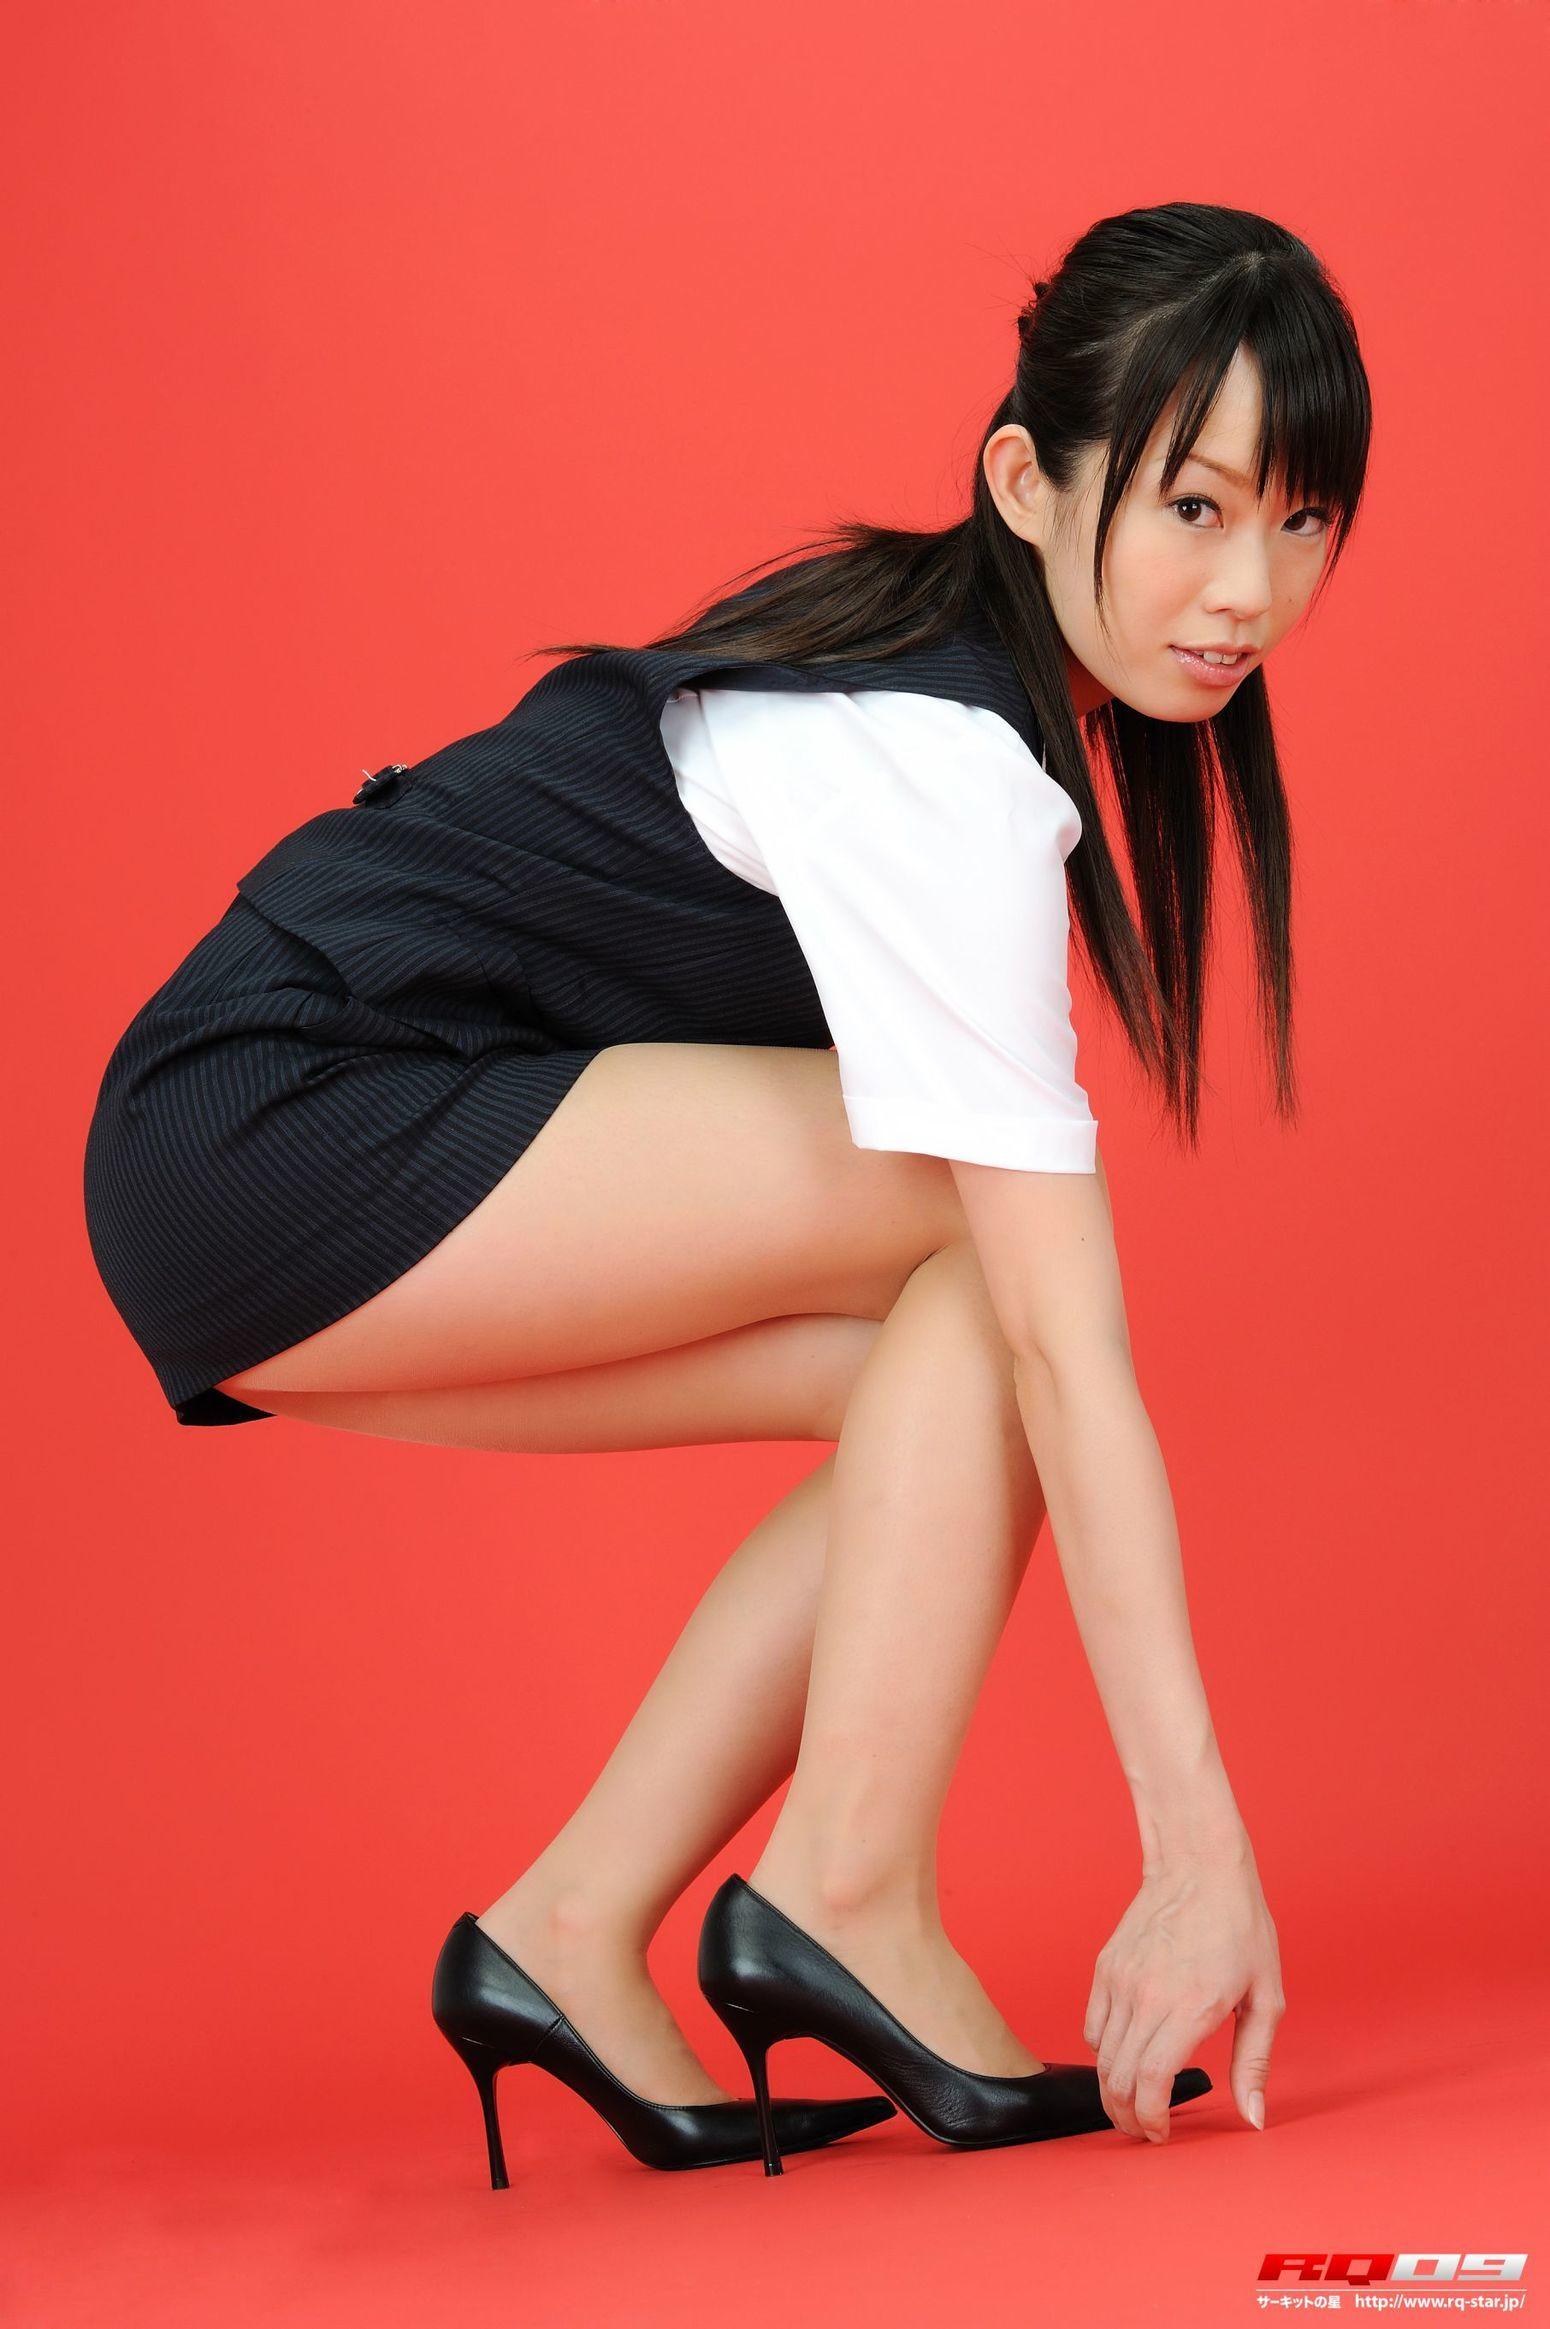 [RQ-STAR] NO.00193 Miyuki Koizumi 小泉みゆき Office Lady 写真集(99) -美女